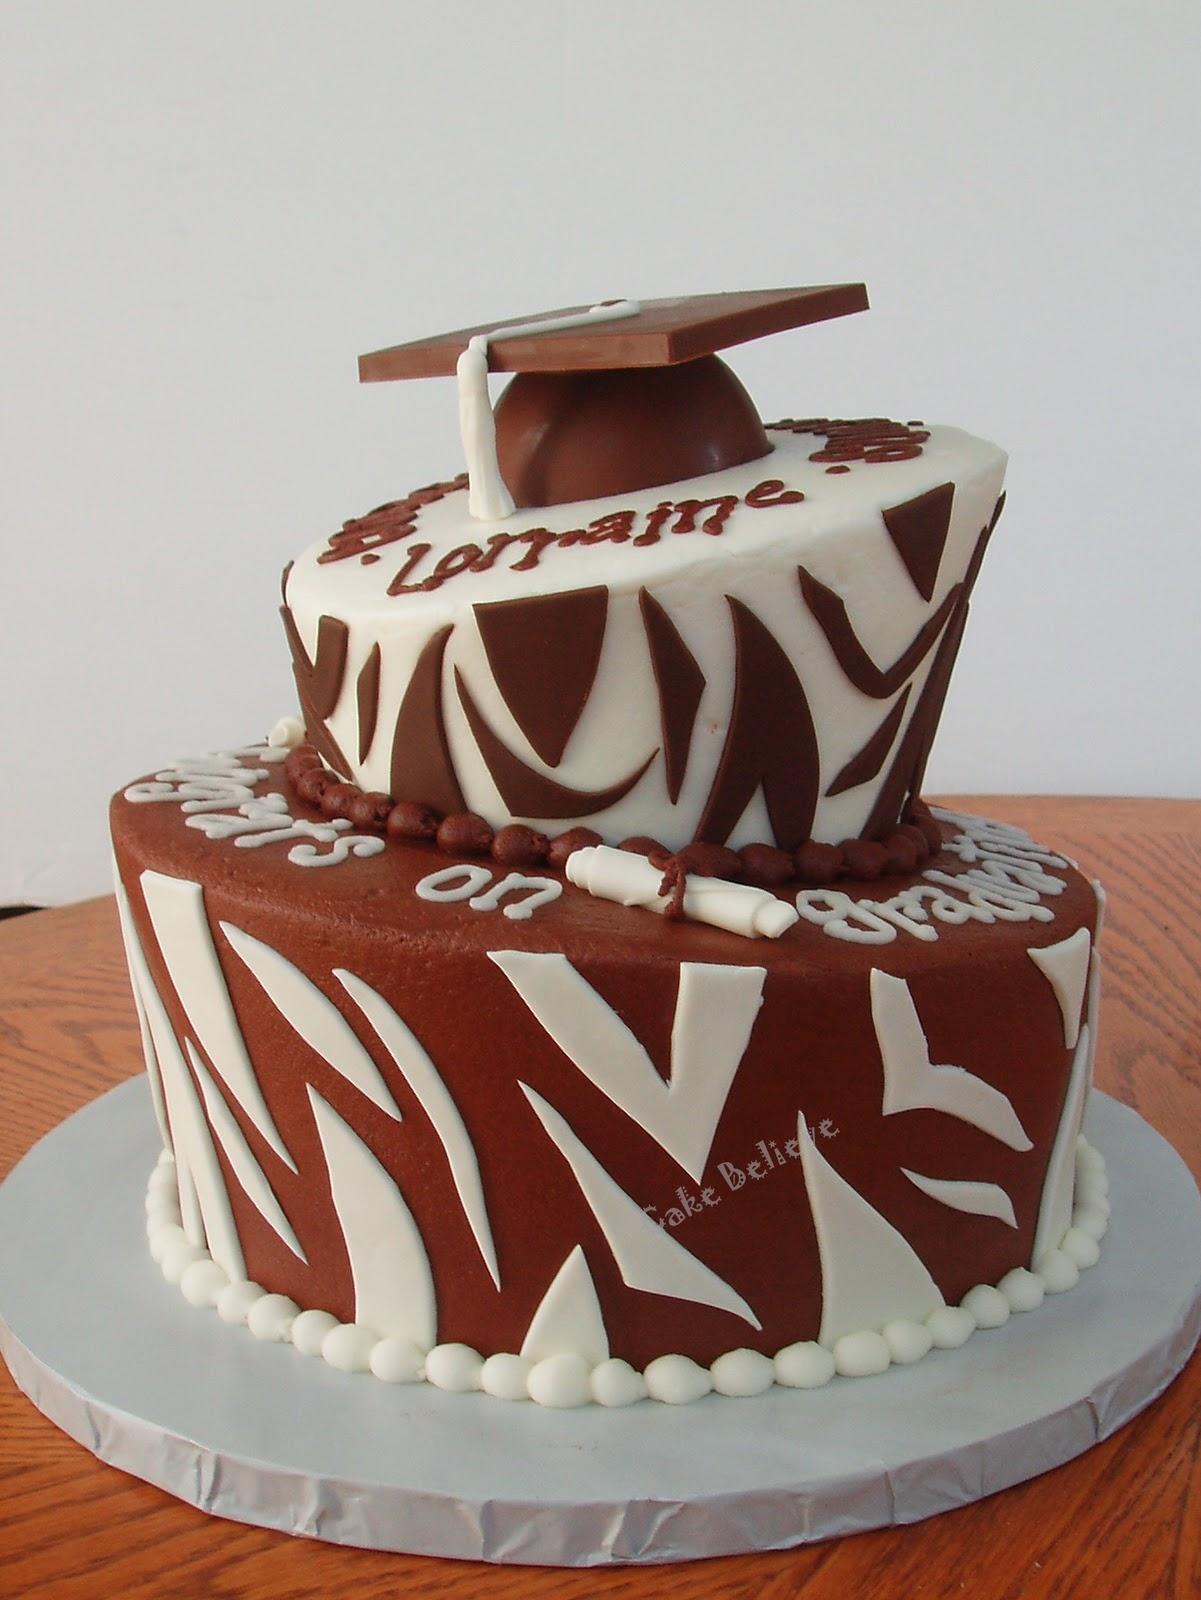 Topsy Turvy Chocolate Graduation